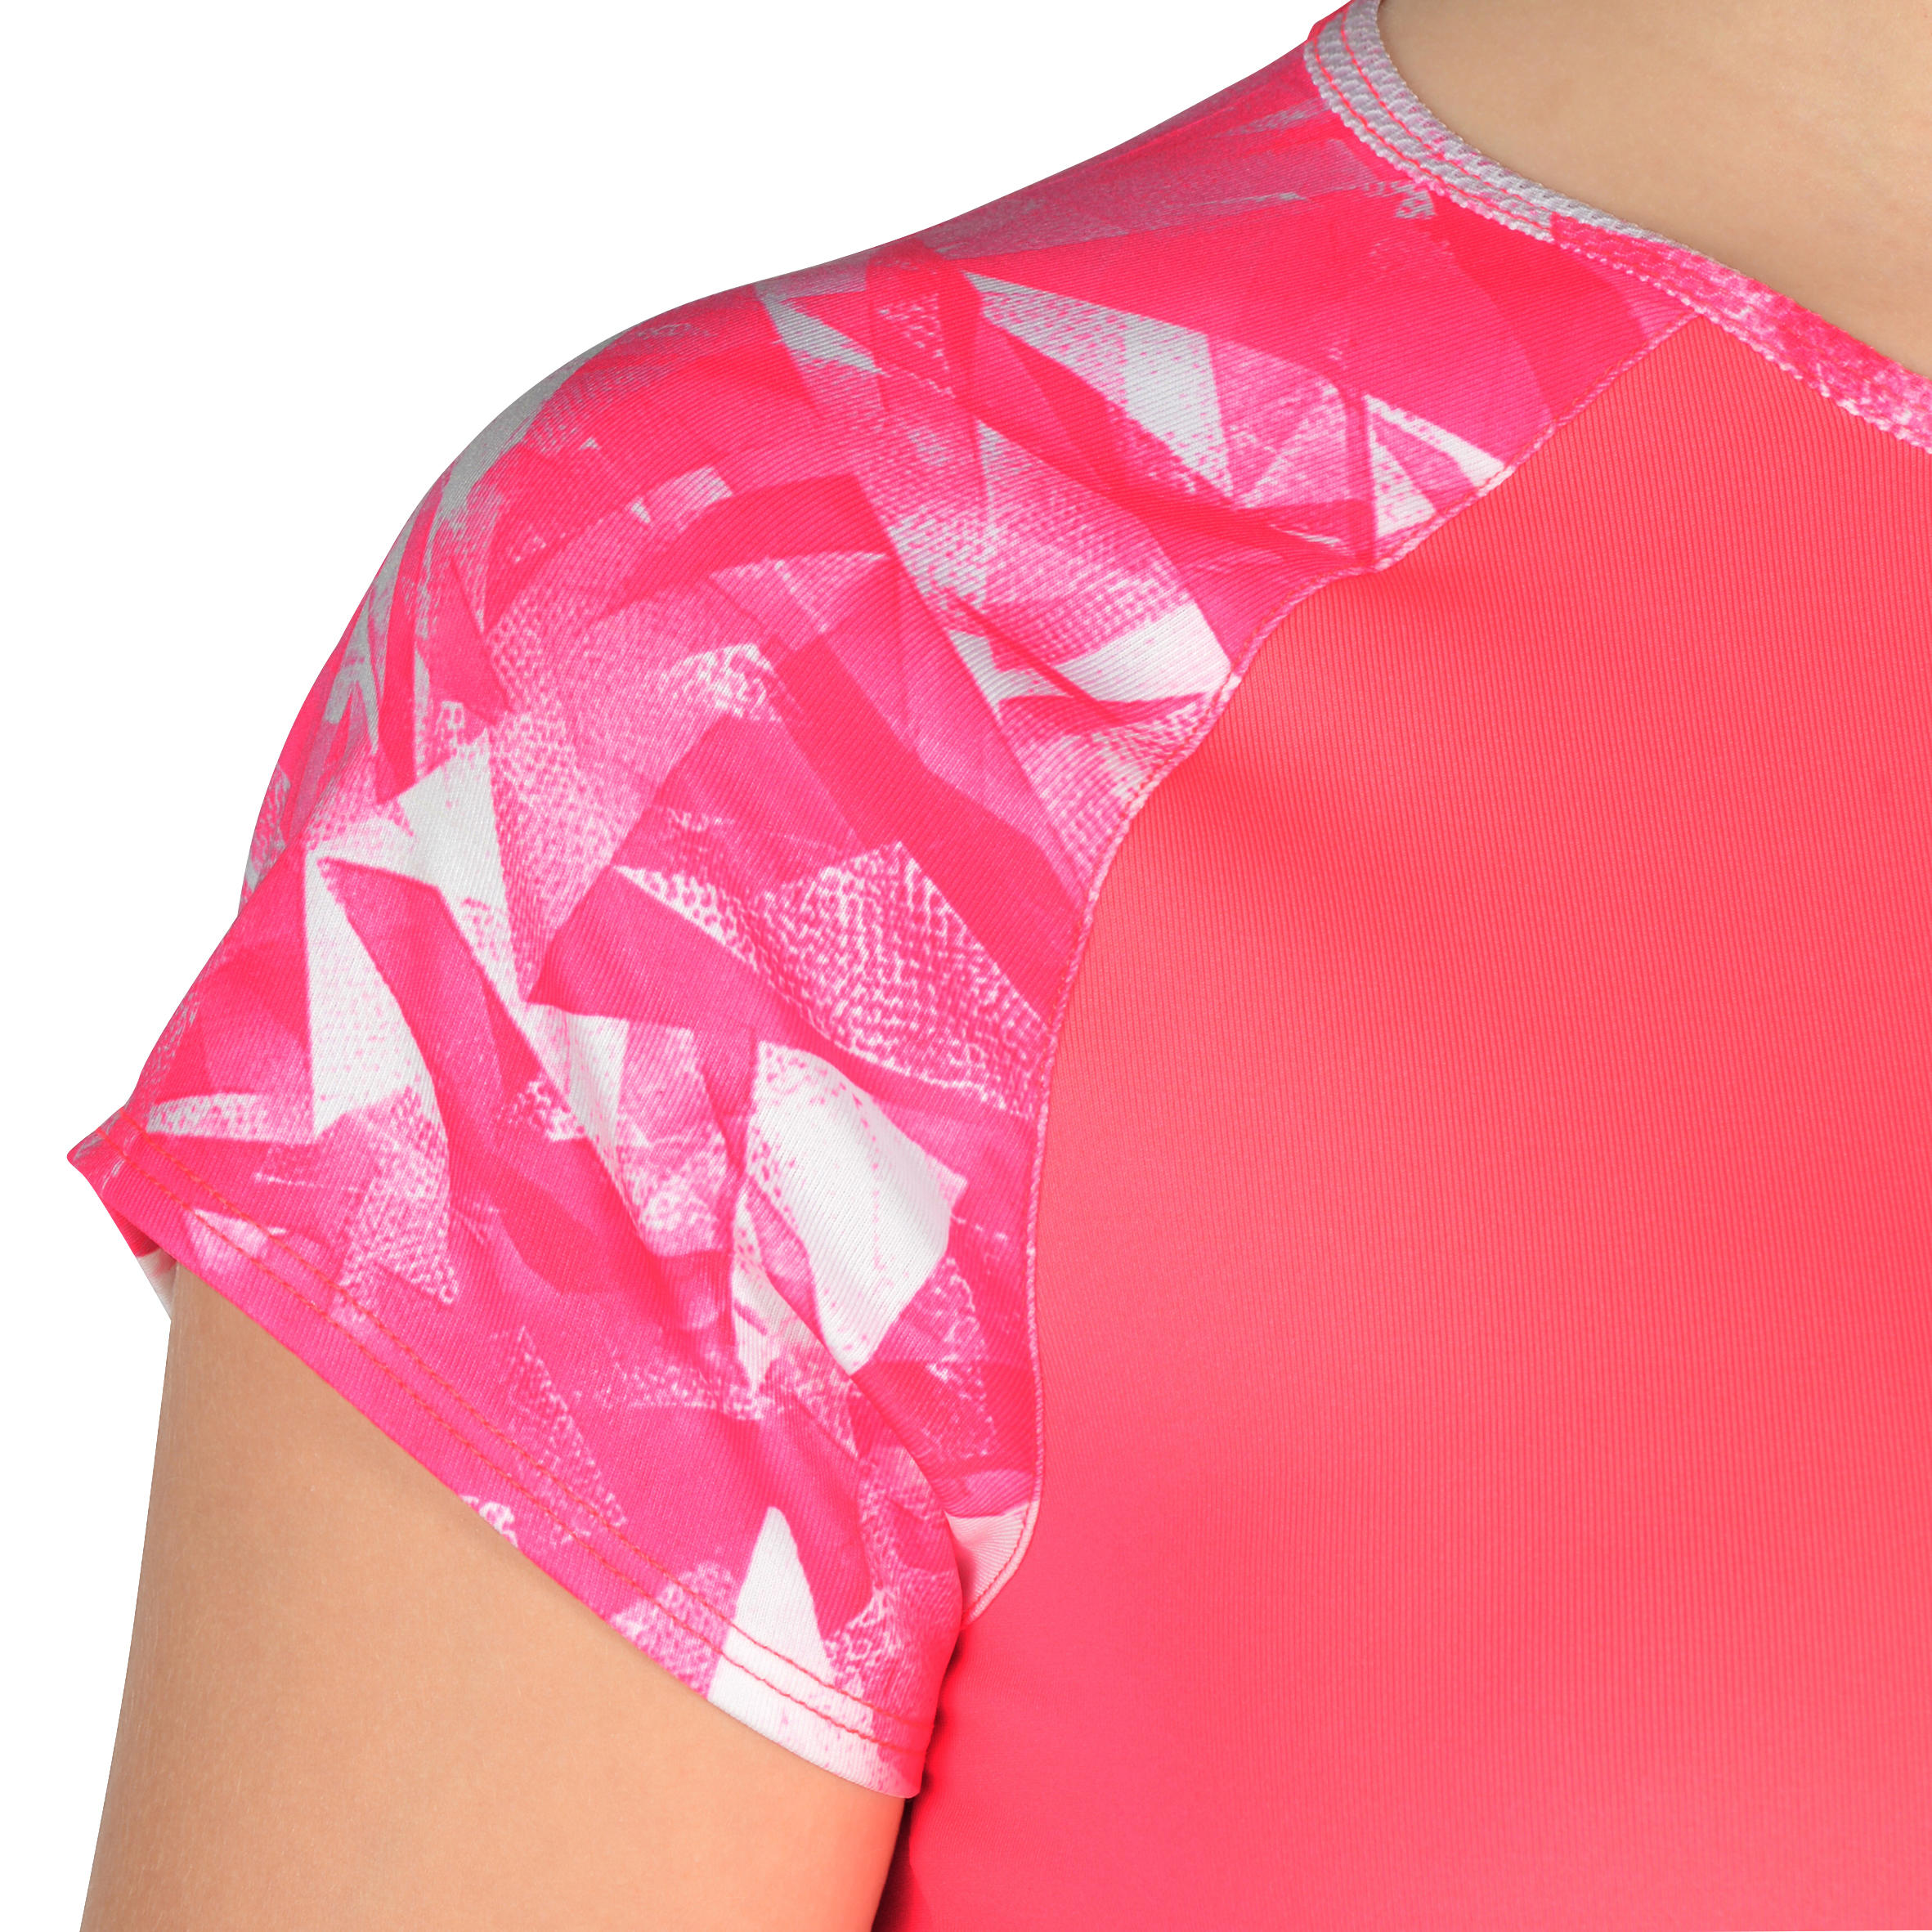 960 Girls' Short-Sleeved Gym T-Shirt - Pink Print